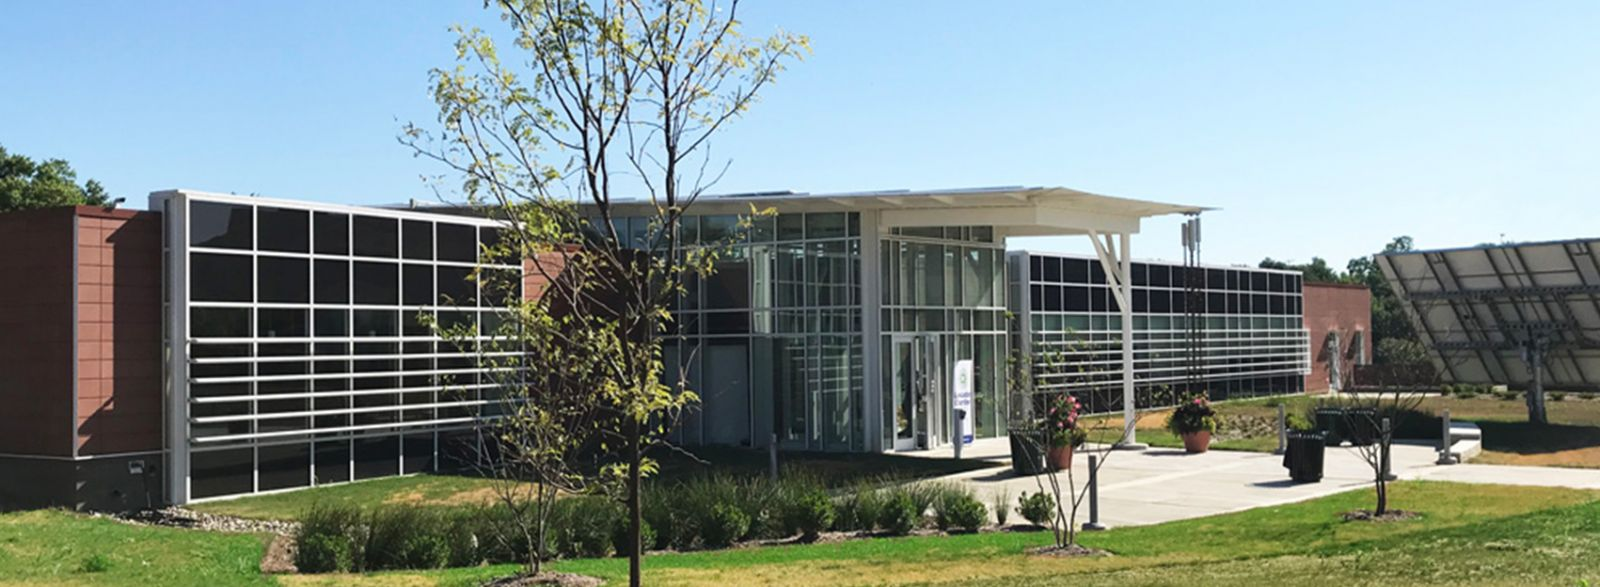 Lombardo center